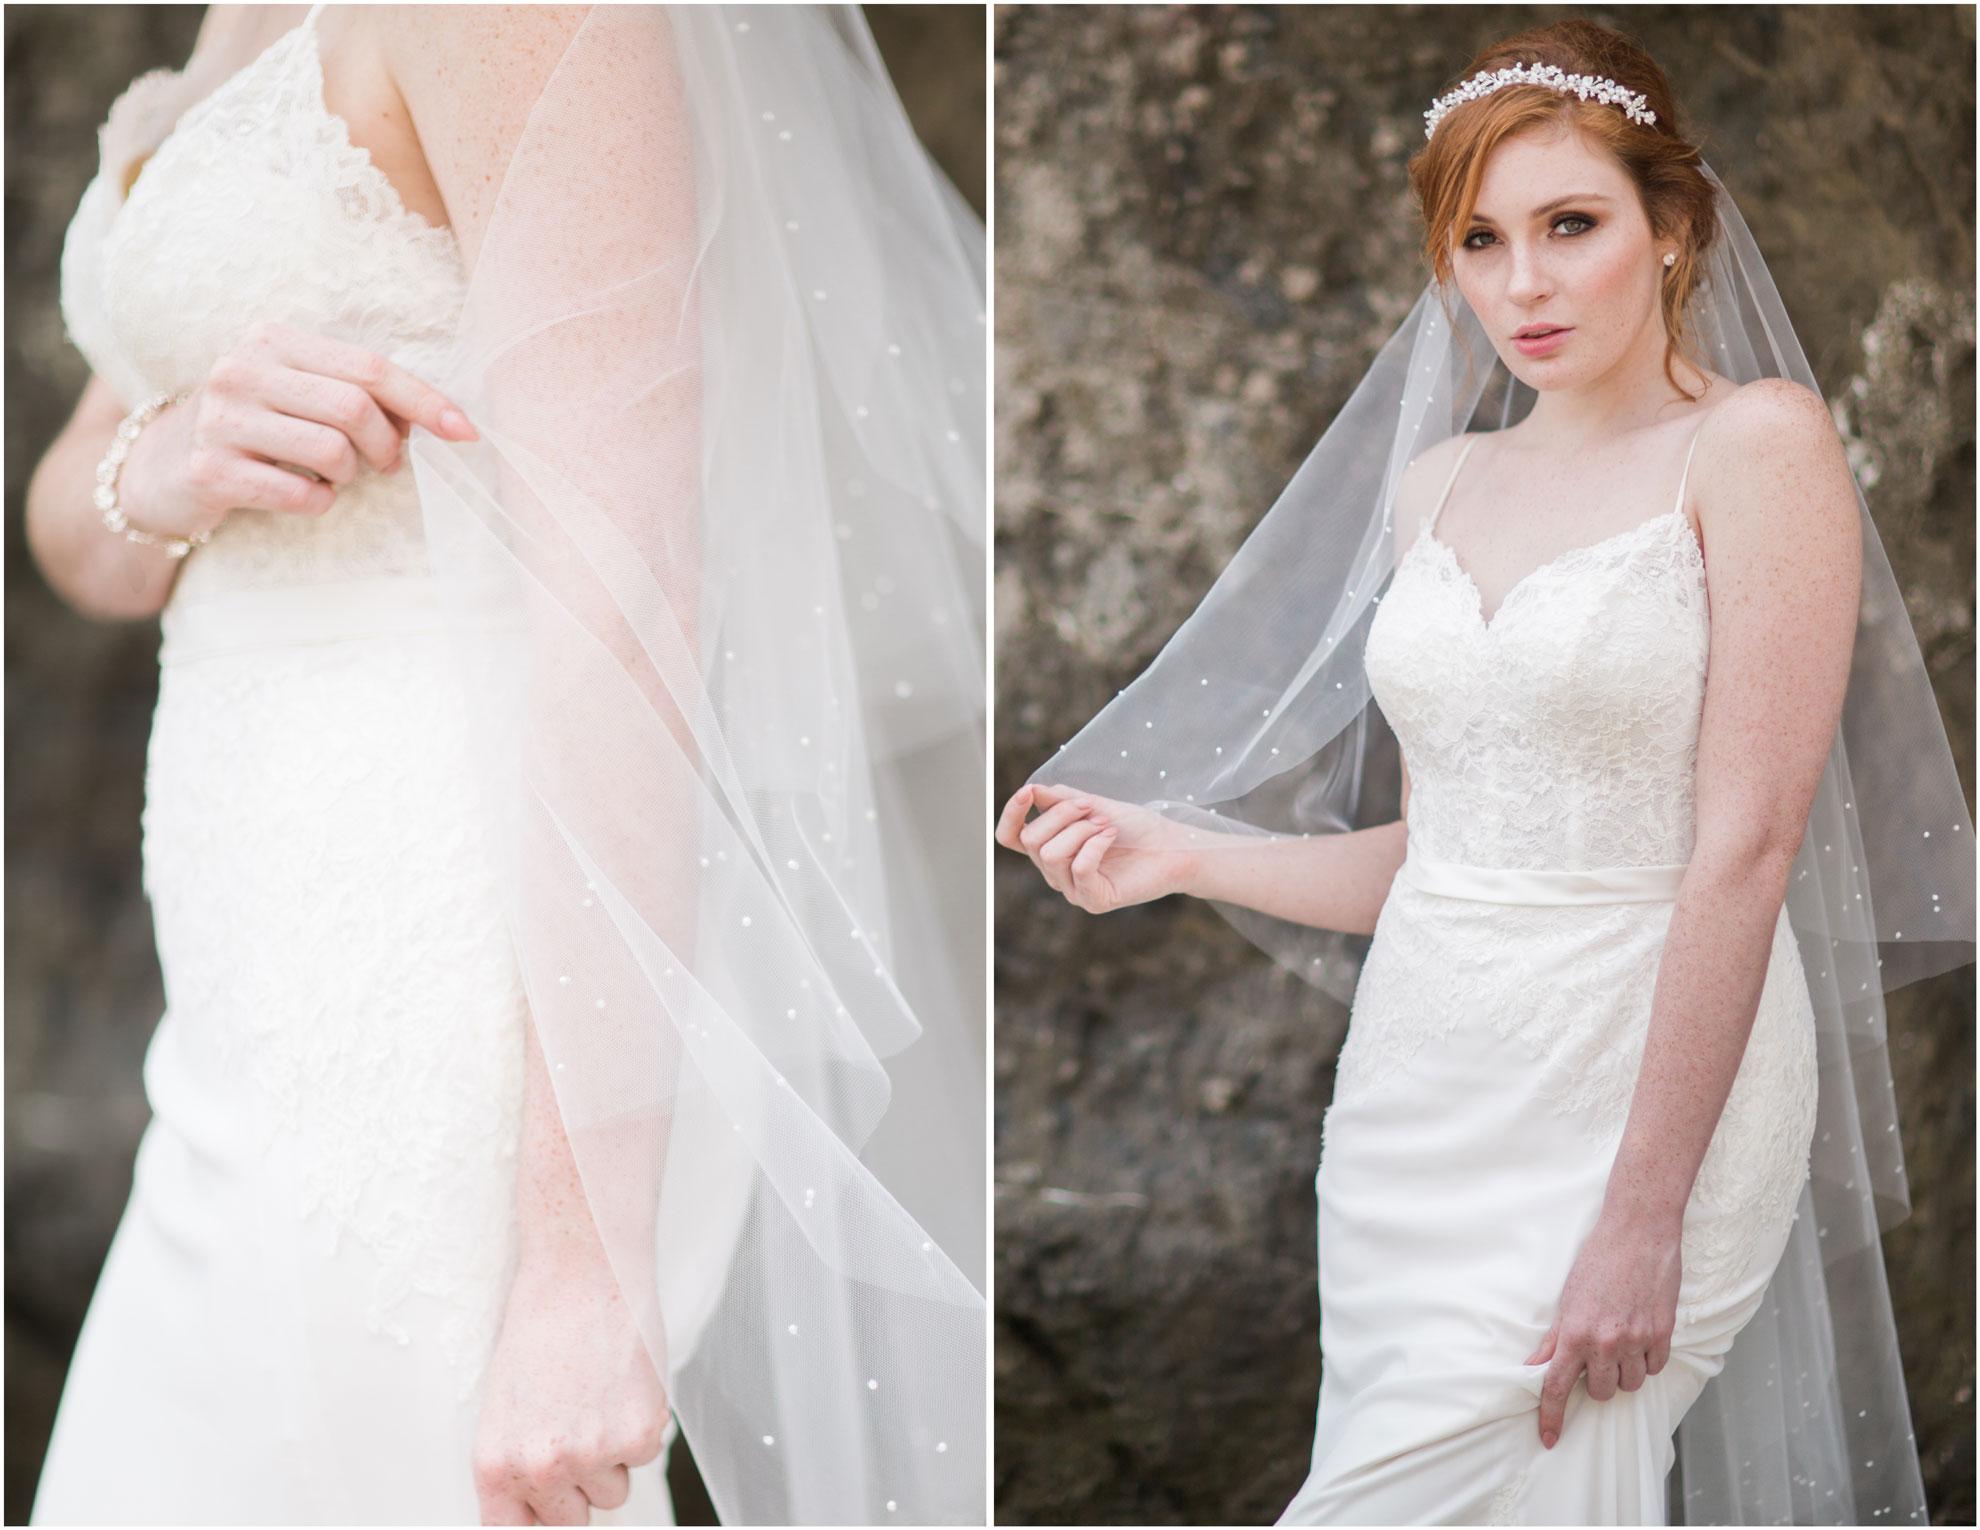 Bel-Aire-Bridal-Jen-Fuj-Photography-V7253